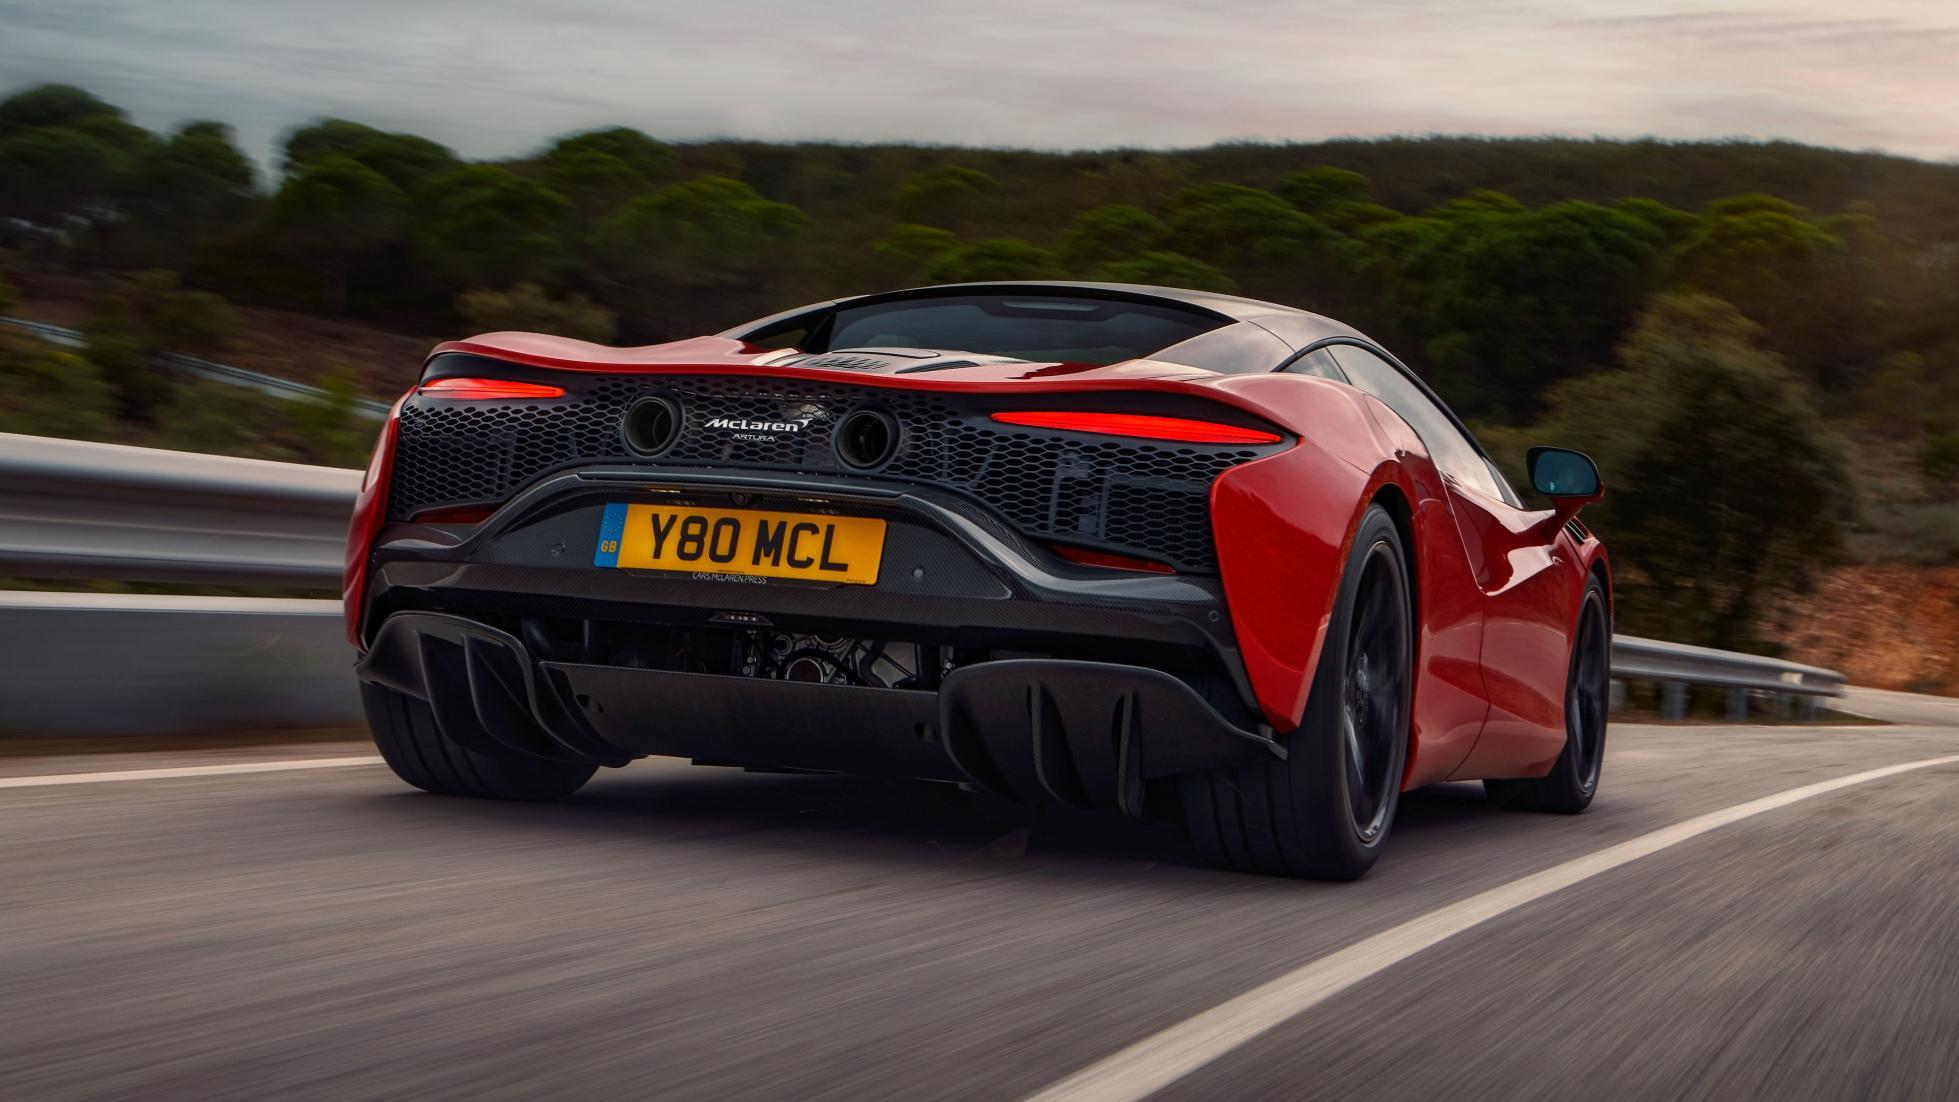 McLaren Artura angled rear view